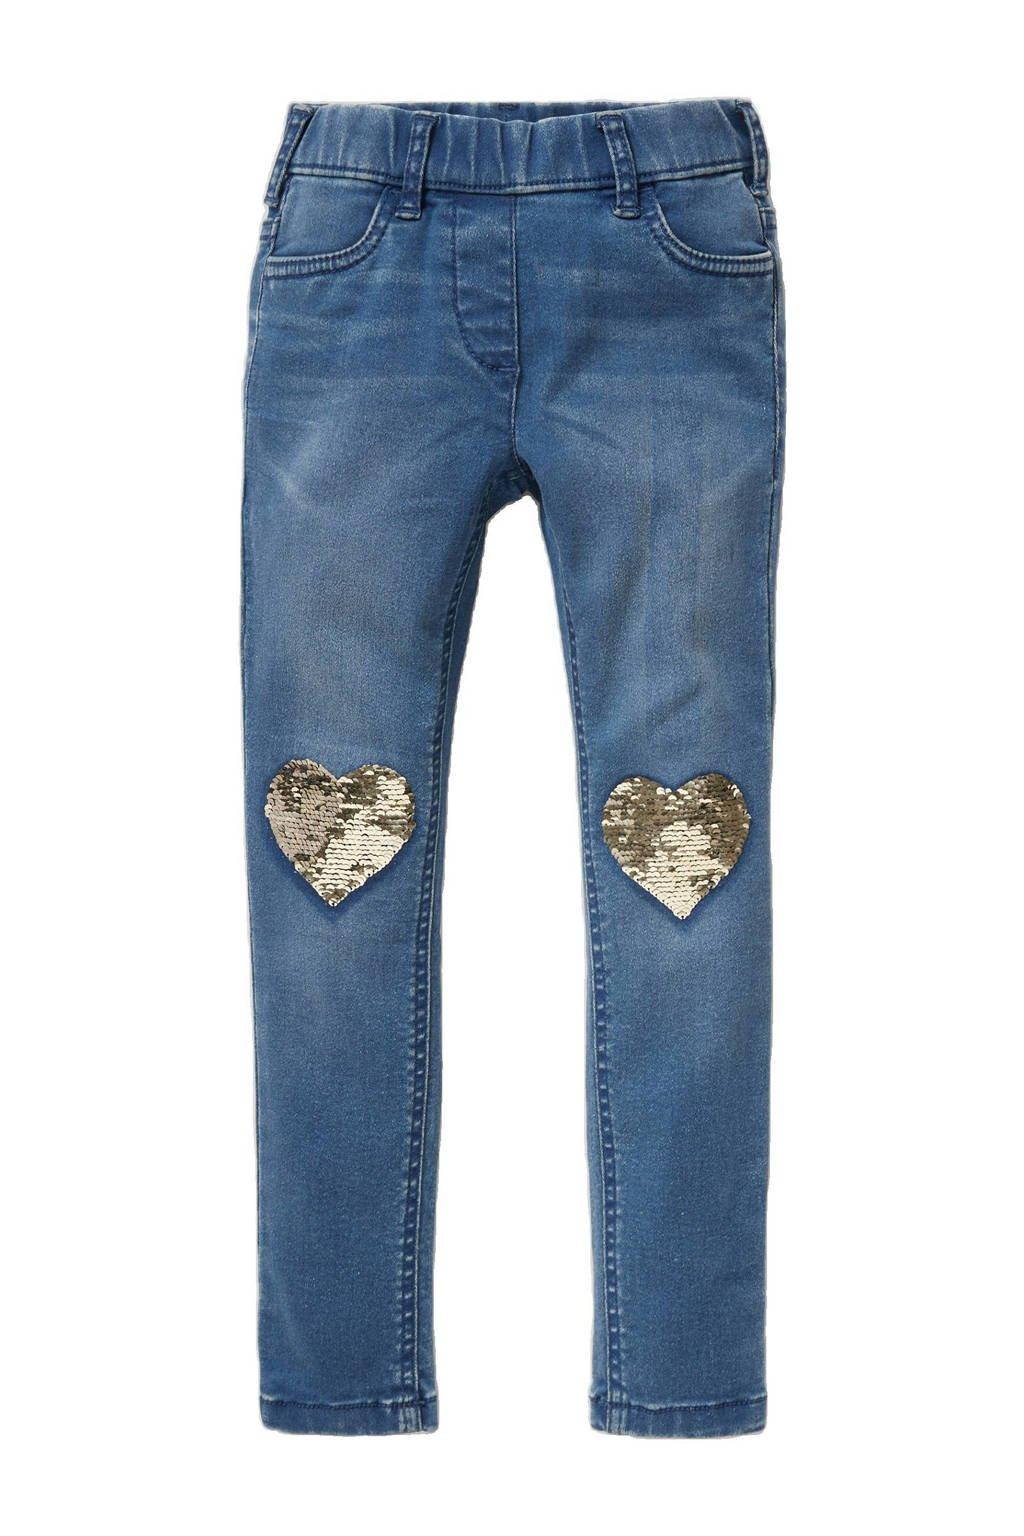 C&A slim fit jeans stonewashed, Stonewashed